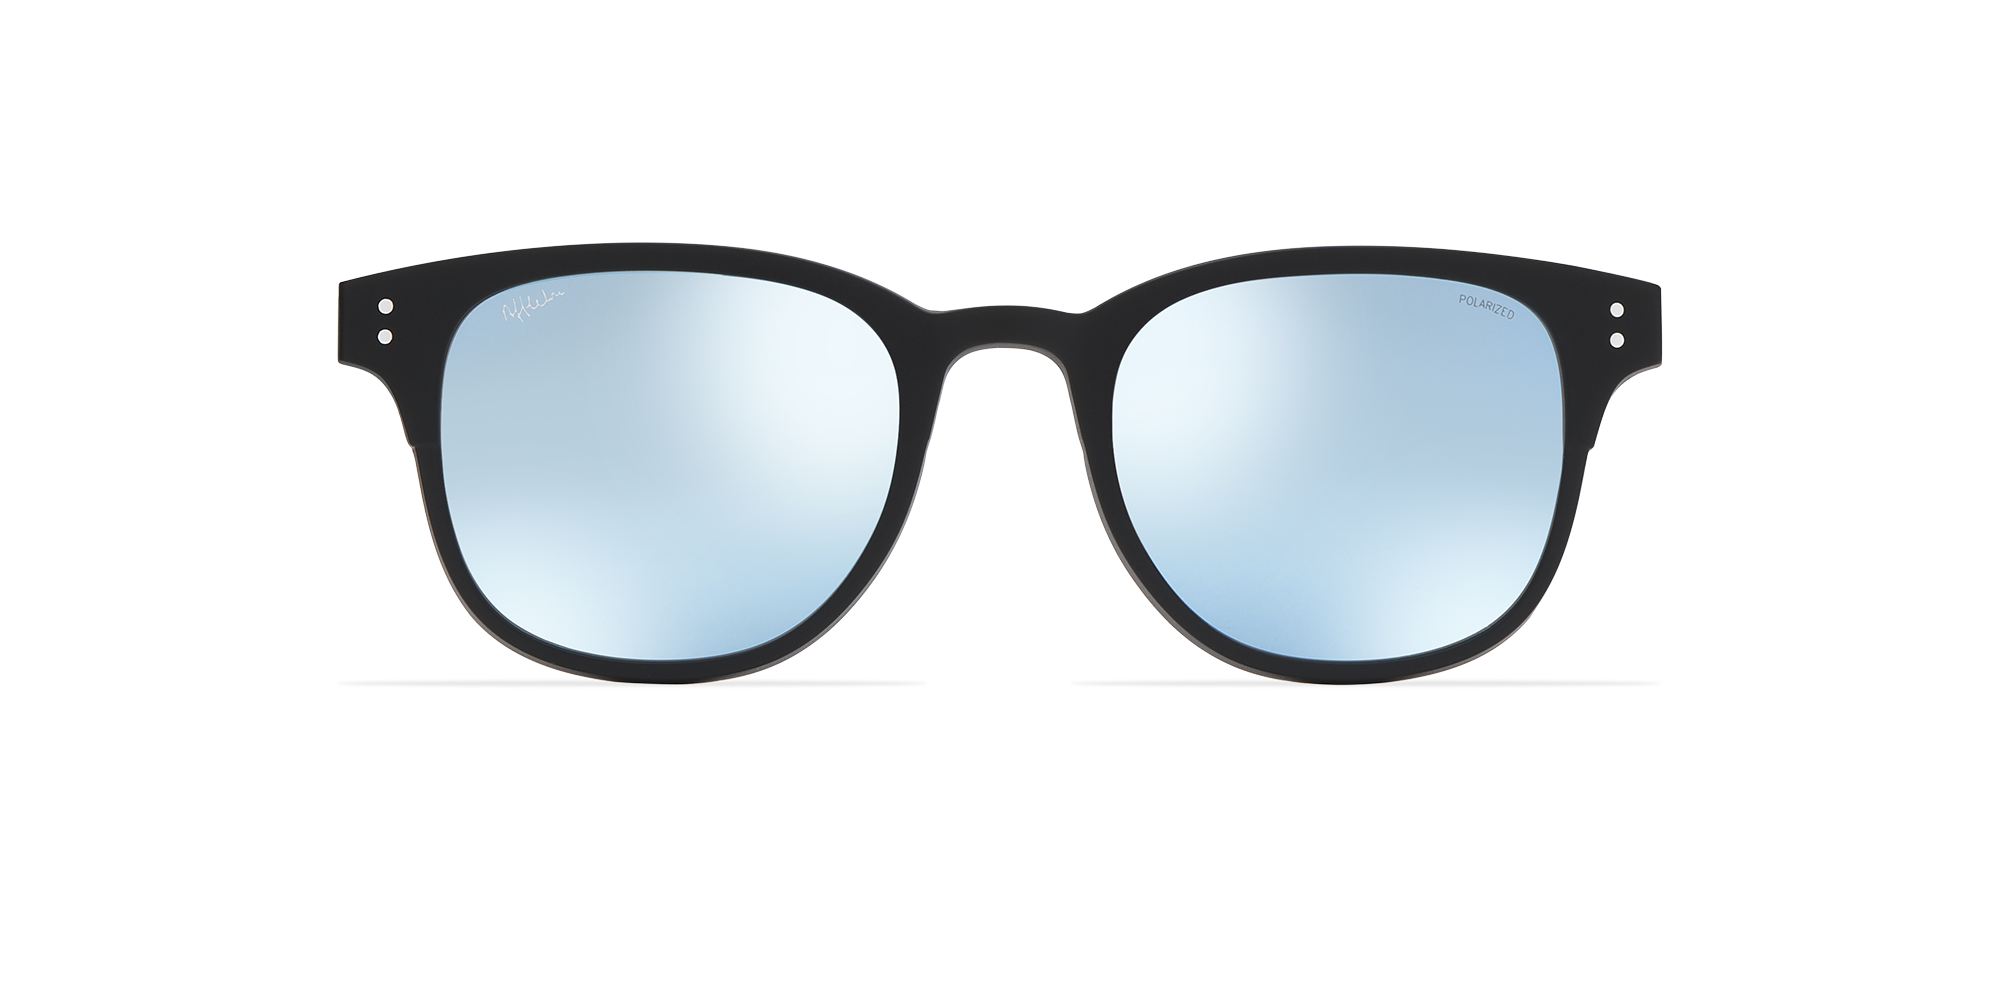 afflelou/france/products/smart_clip/clips_glasses/TMK34PRBK015021.png